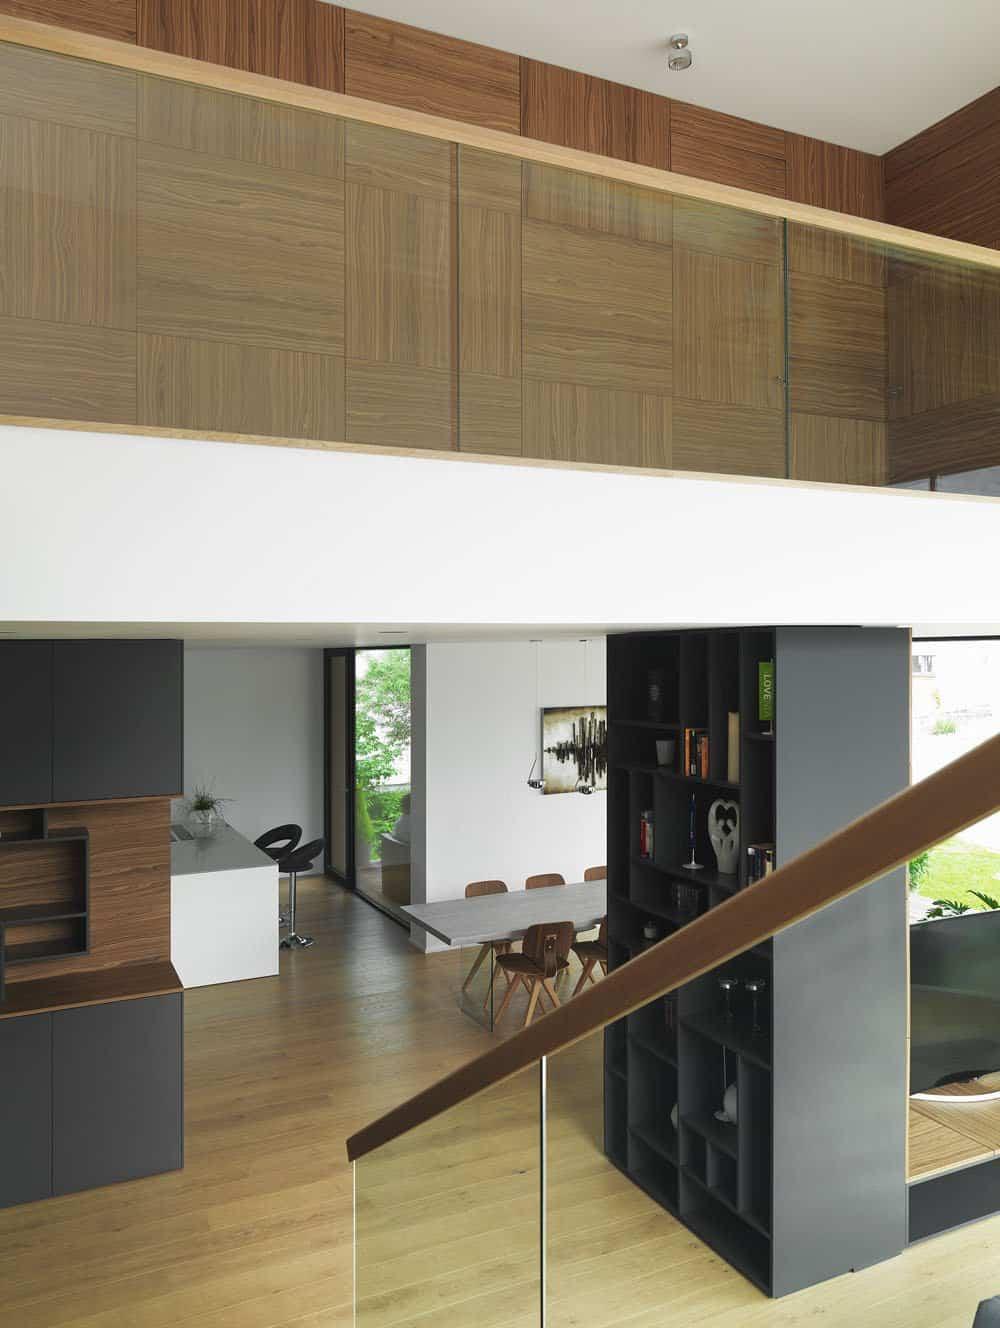 casa modular viena 8